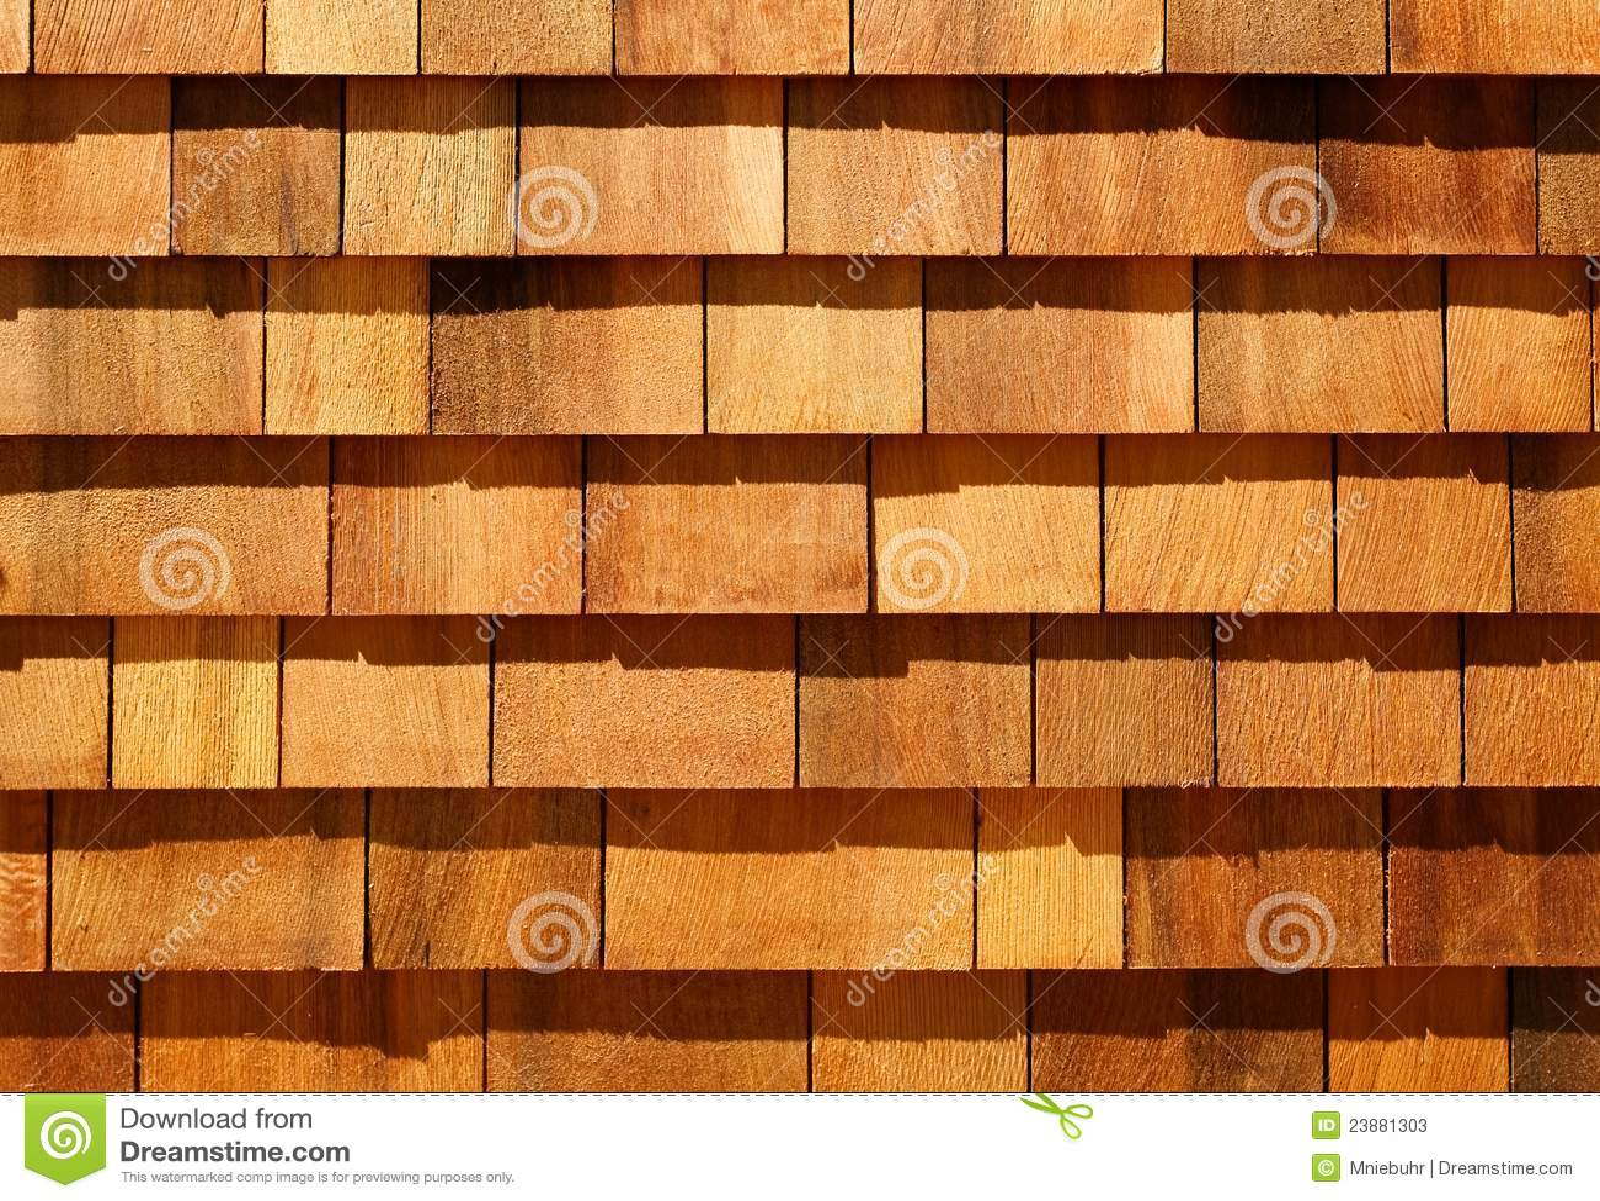 Western Red Cedar Wood Shingles As Wall Siding Stock